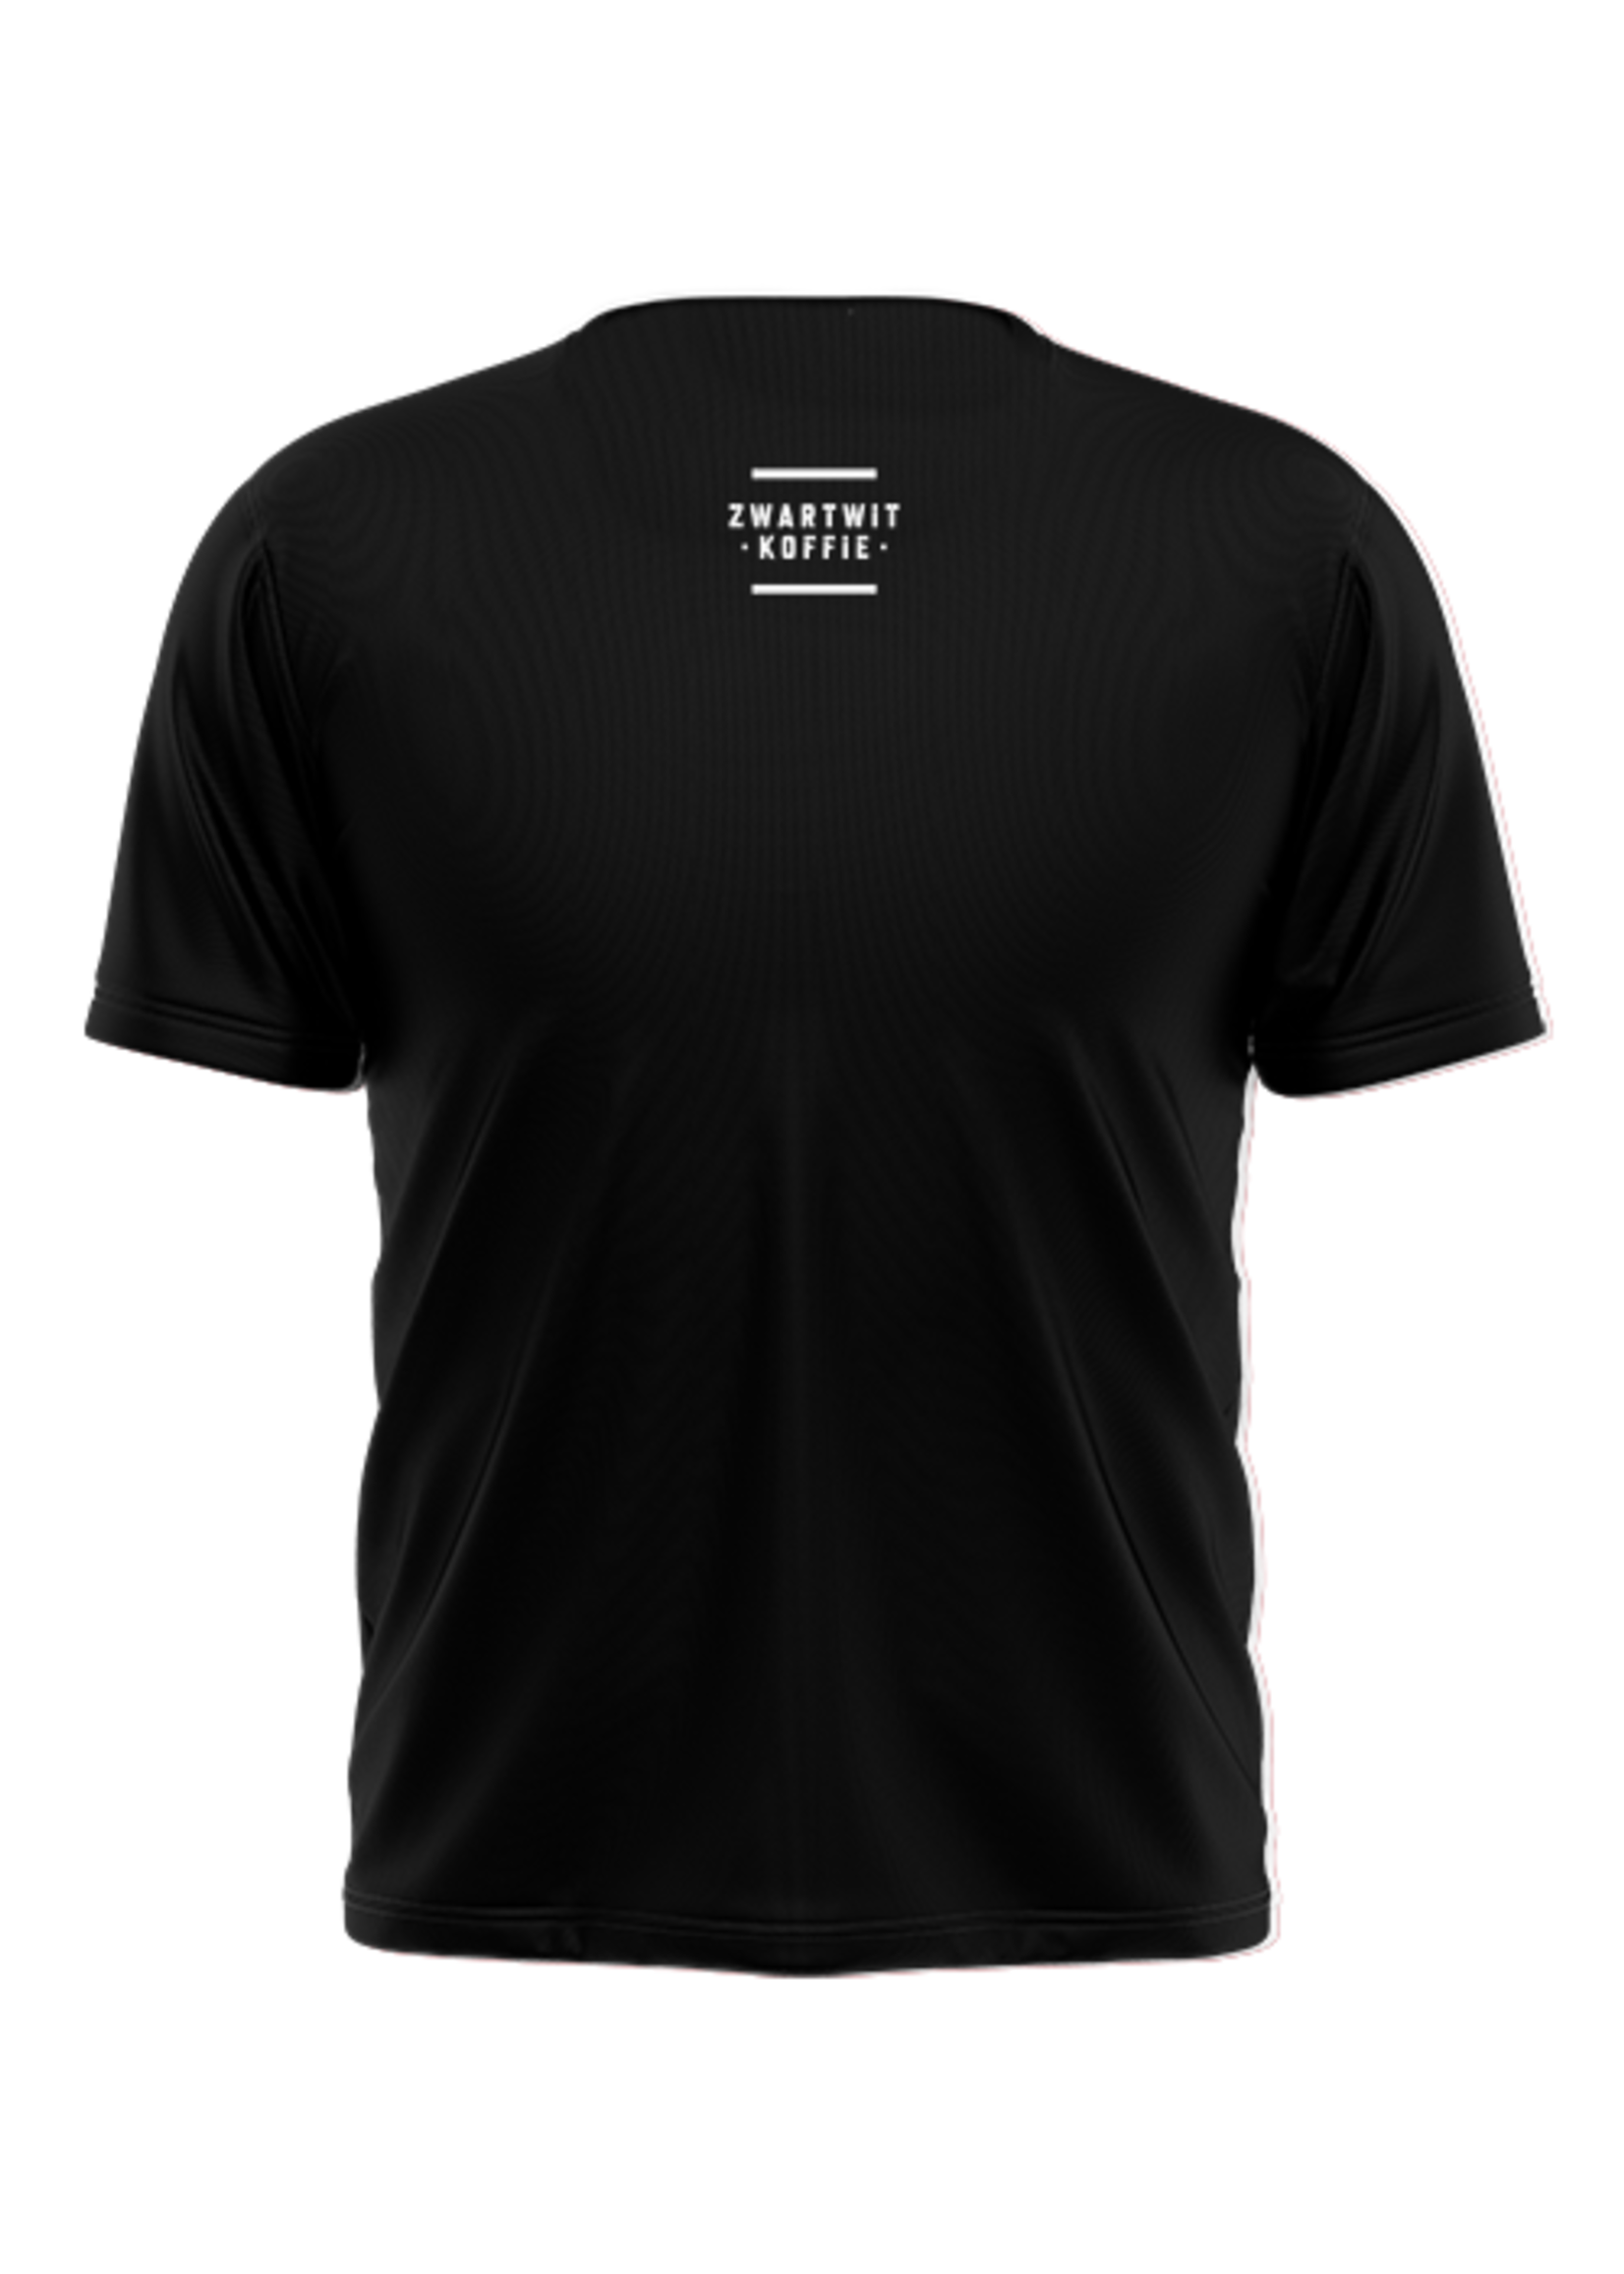 Rebel & Dutch ZwartWit T-shirt pink white